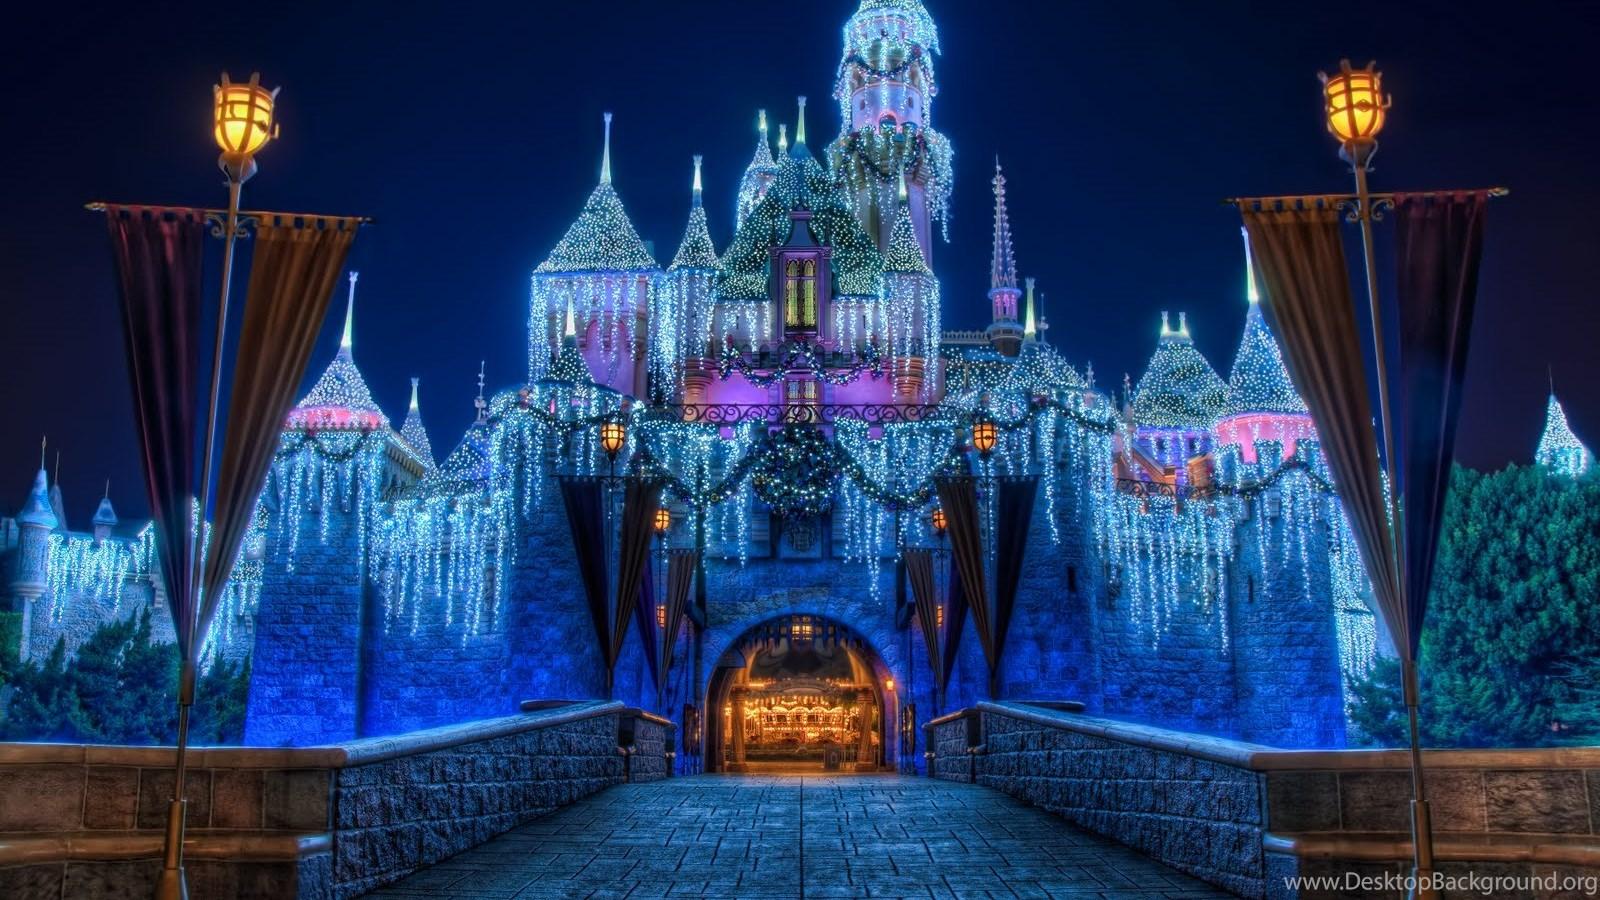 Disney Christmas Wallpapers 38484 Hd Wallpapers Desktop Background